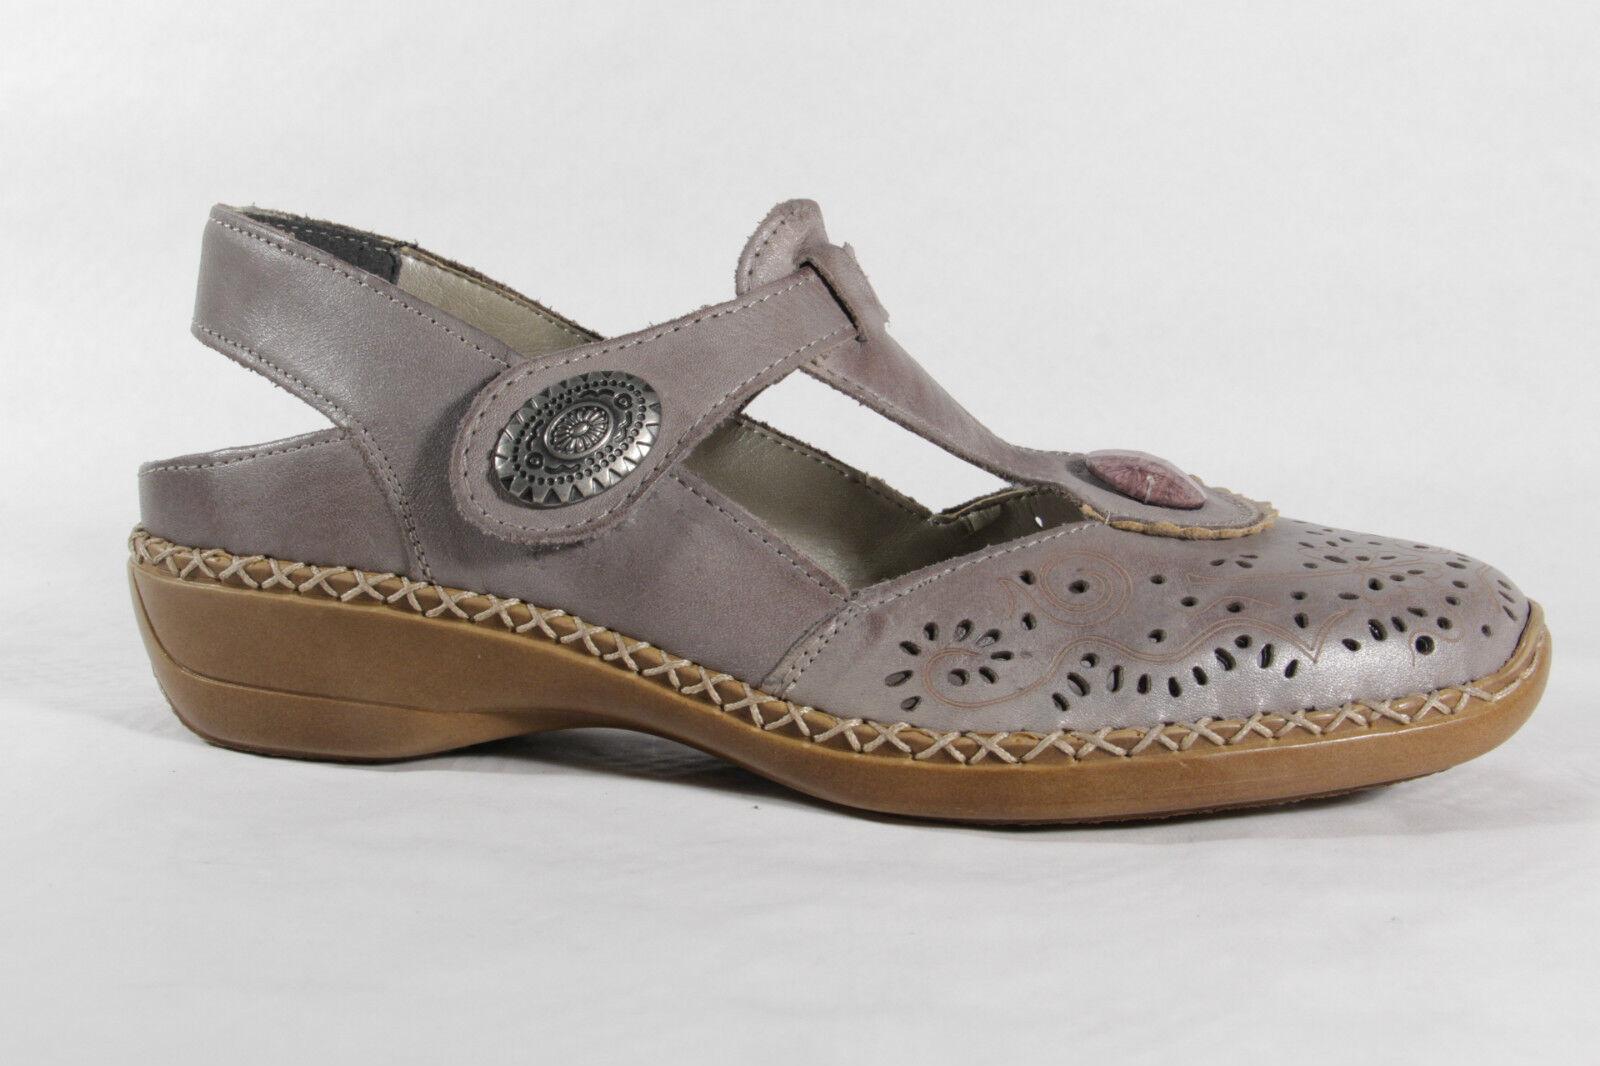 Rieker  Damen Slipper/ Sling/ Sandale,  Rieker weiche Lederinnensohle, grau, NEU d5ef97